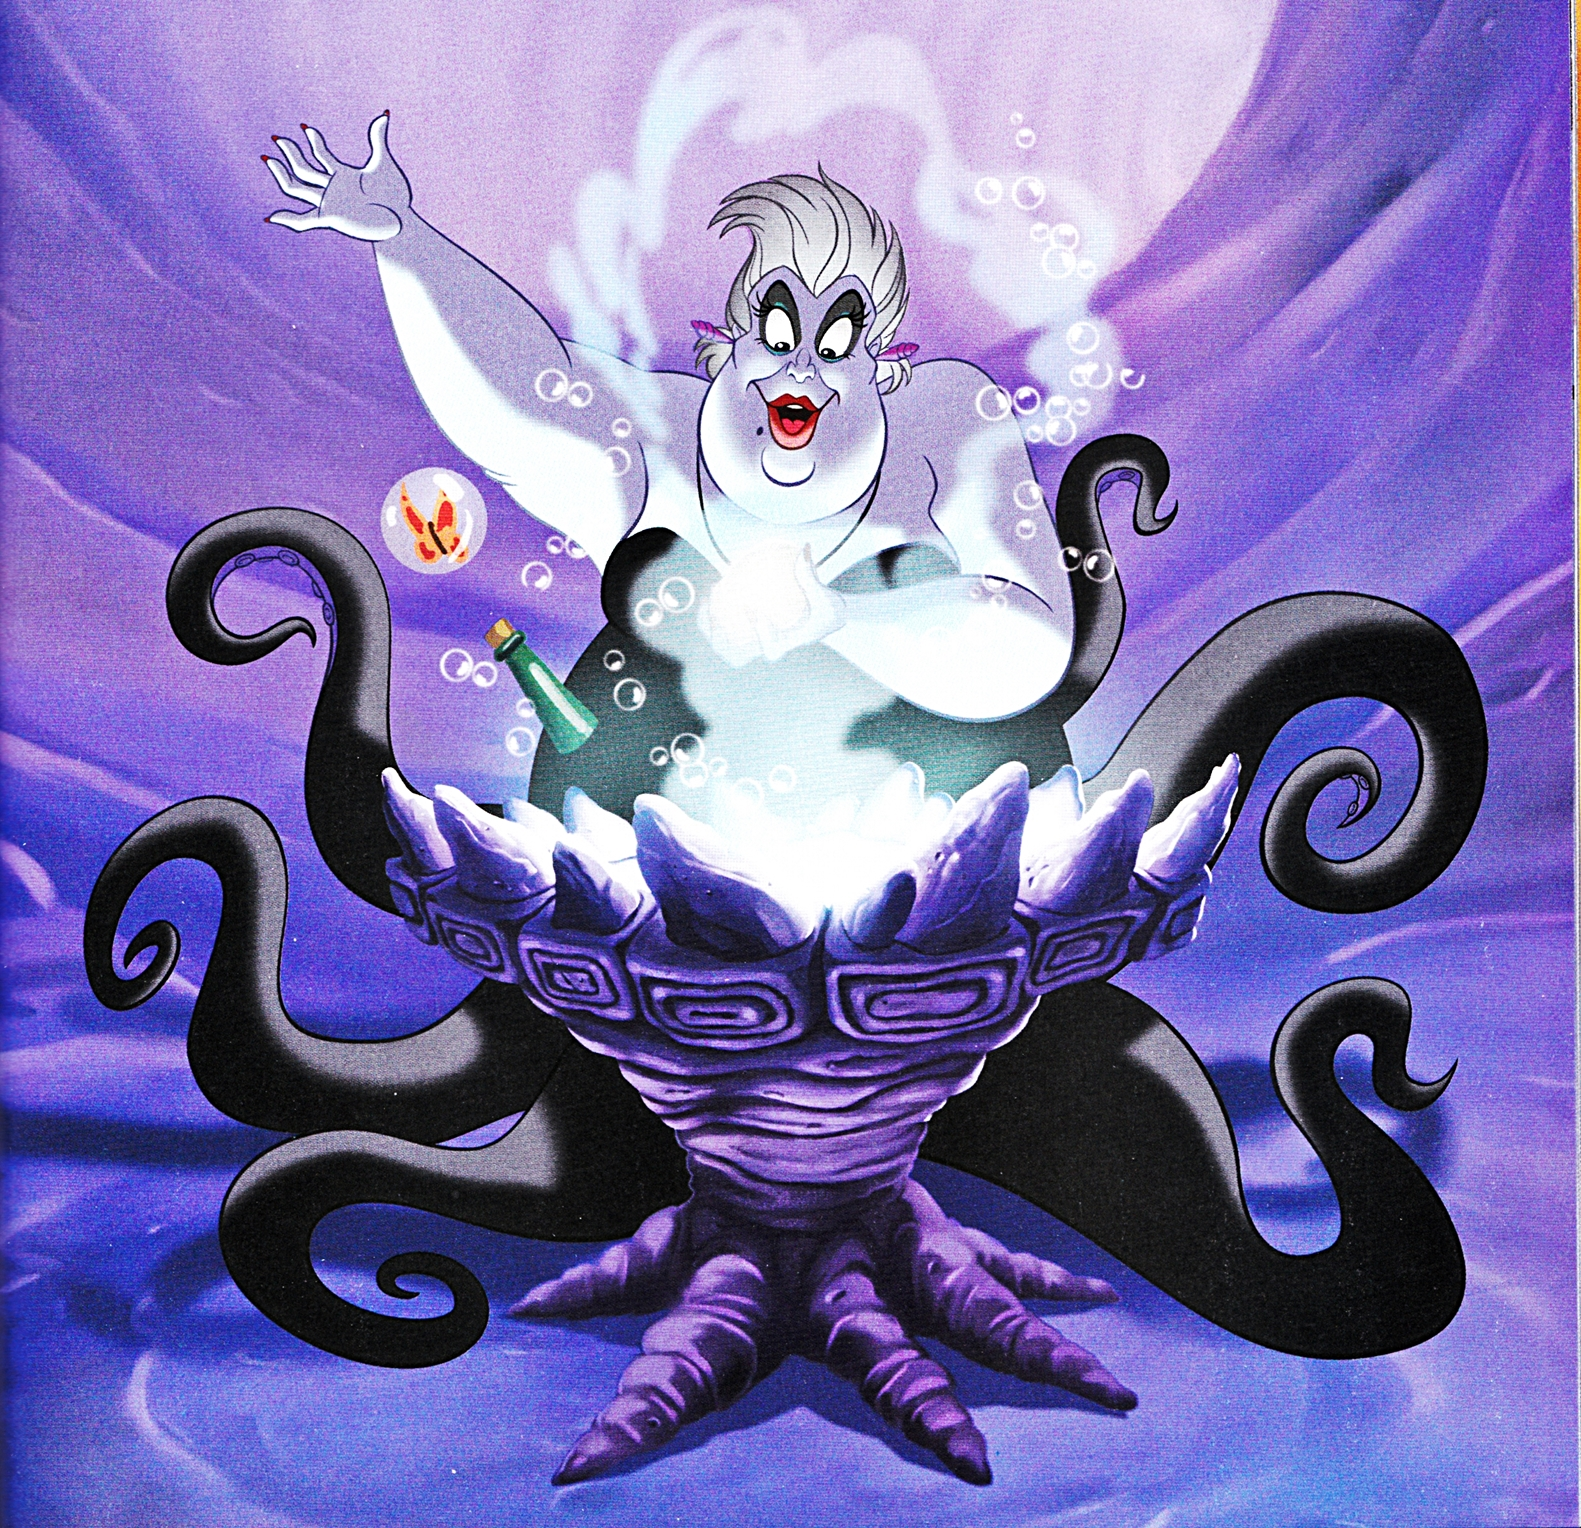 Walt-Disney-Book-Images-Ursula-walt-disney-characters-35271406-1581